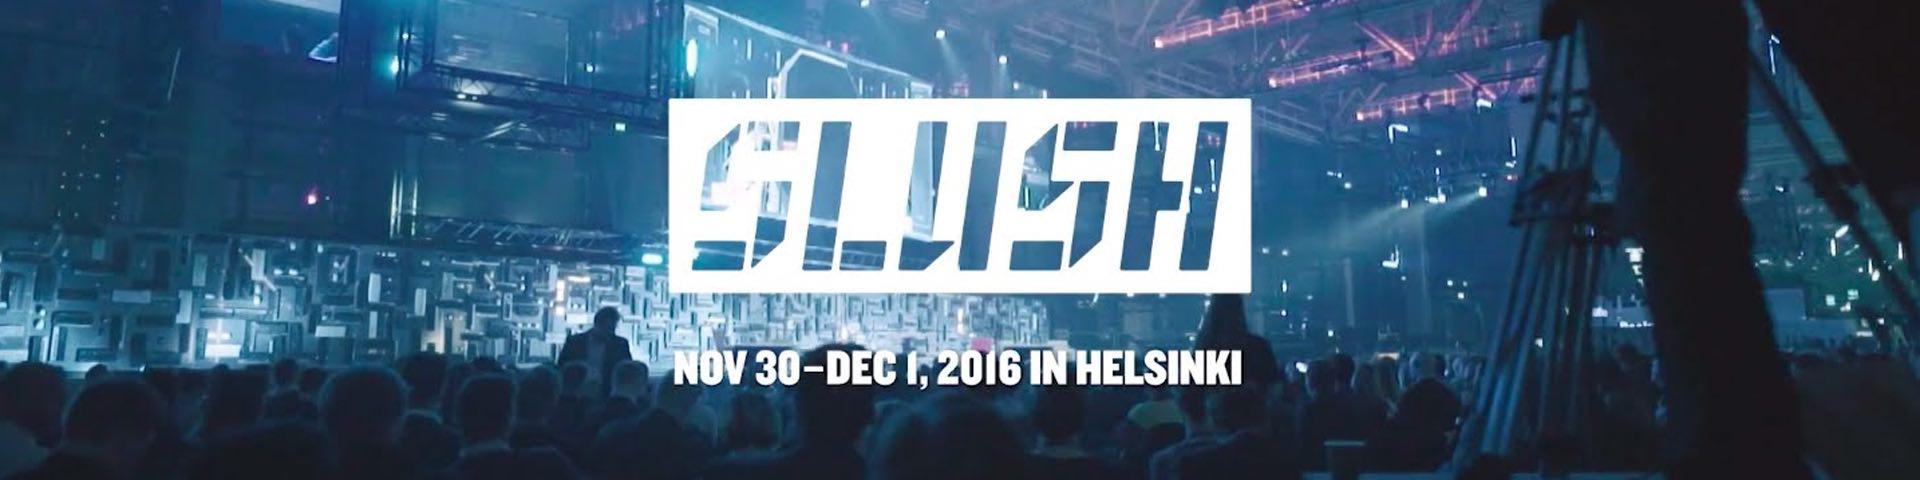 Slush 2016 avec Business France